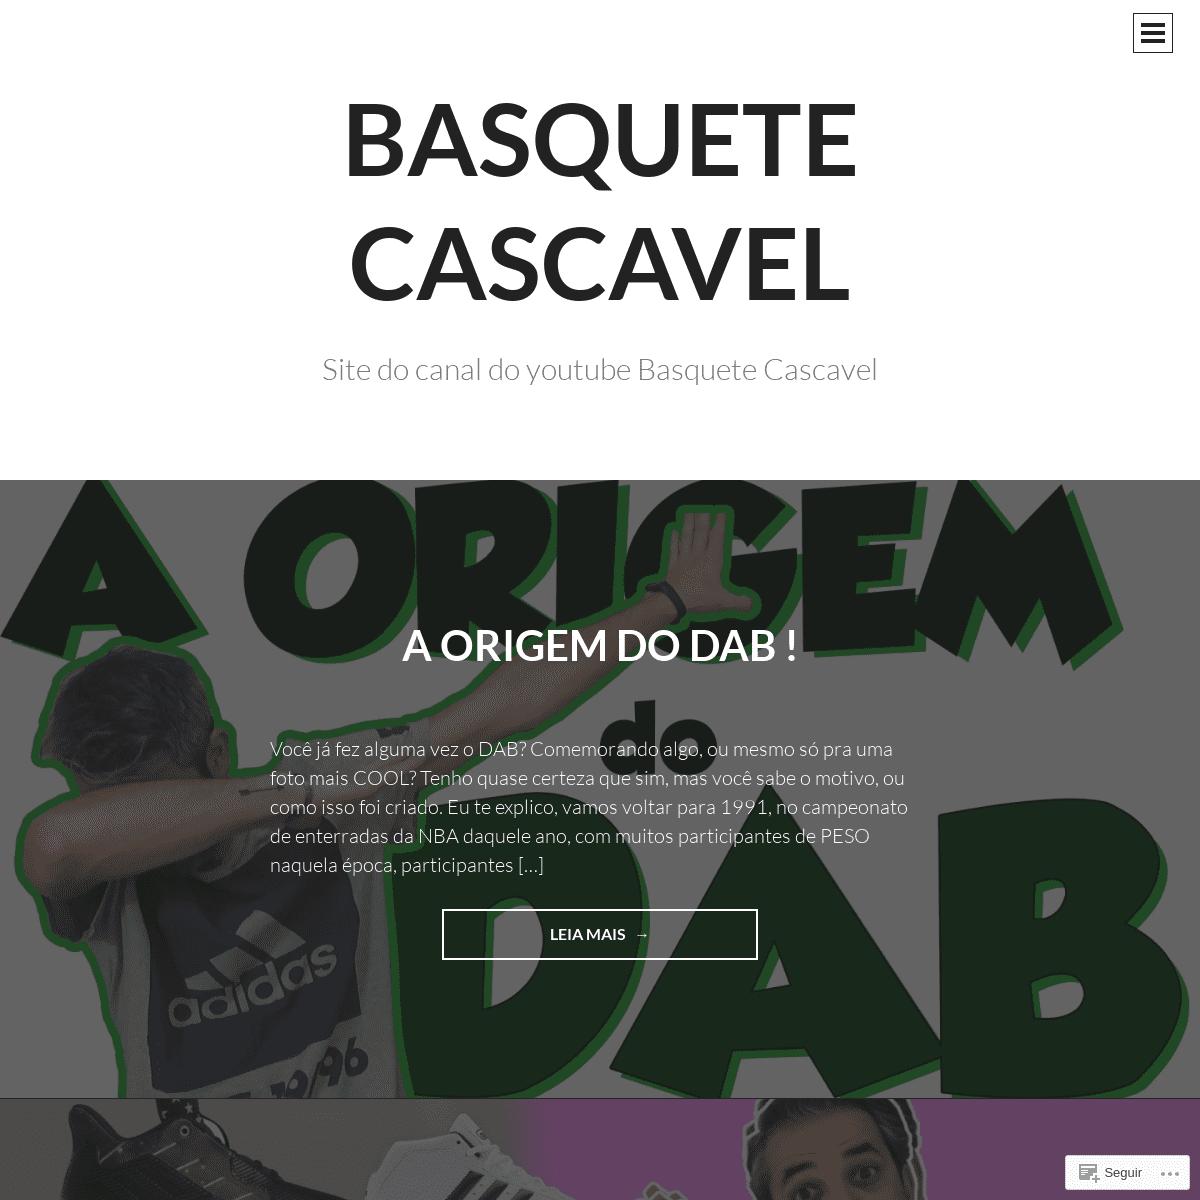 Basquete Cascavel - Site do canal do youtube Basquete Cascavel